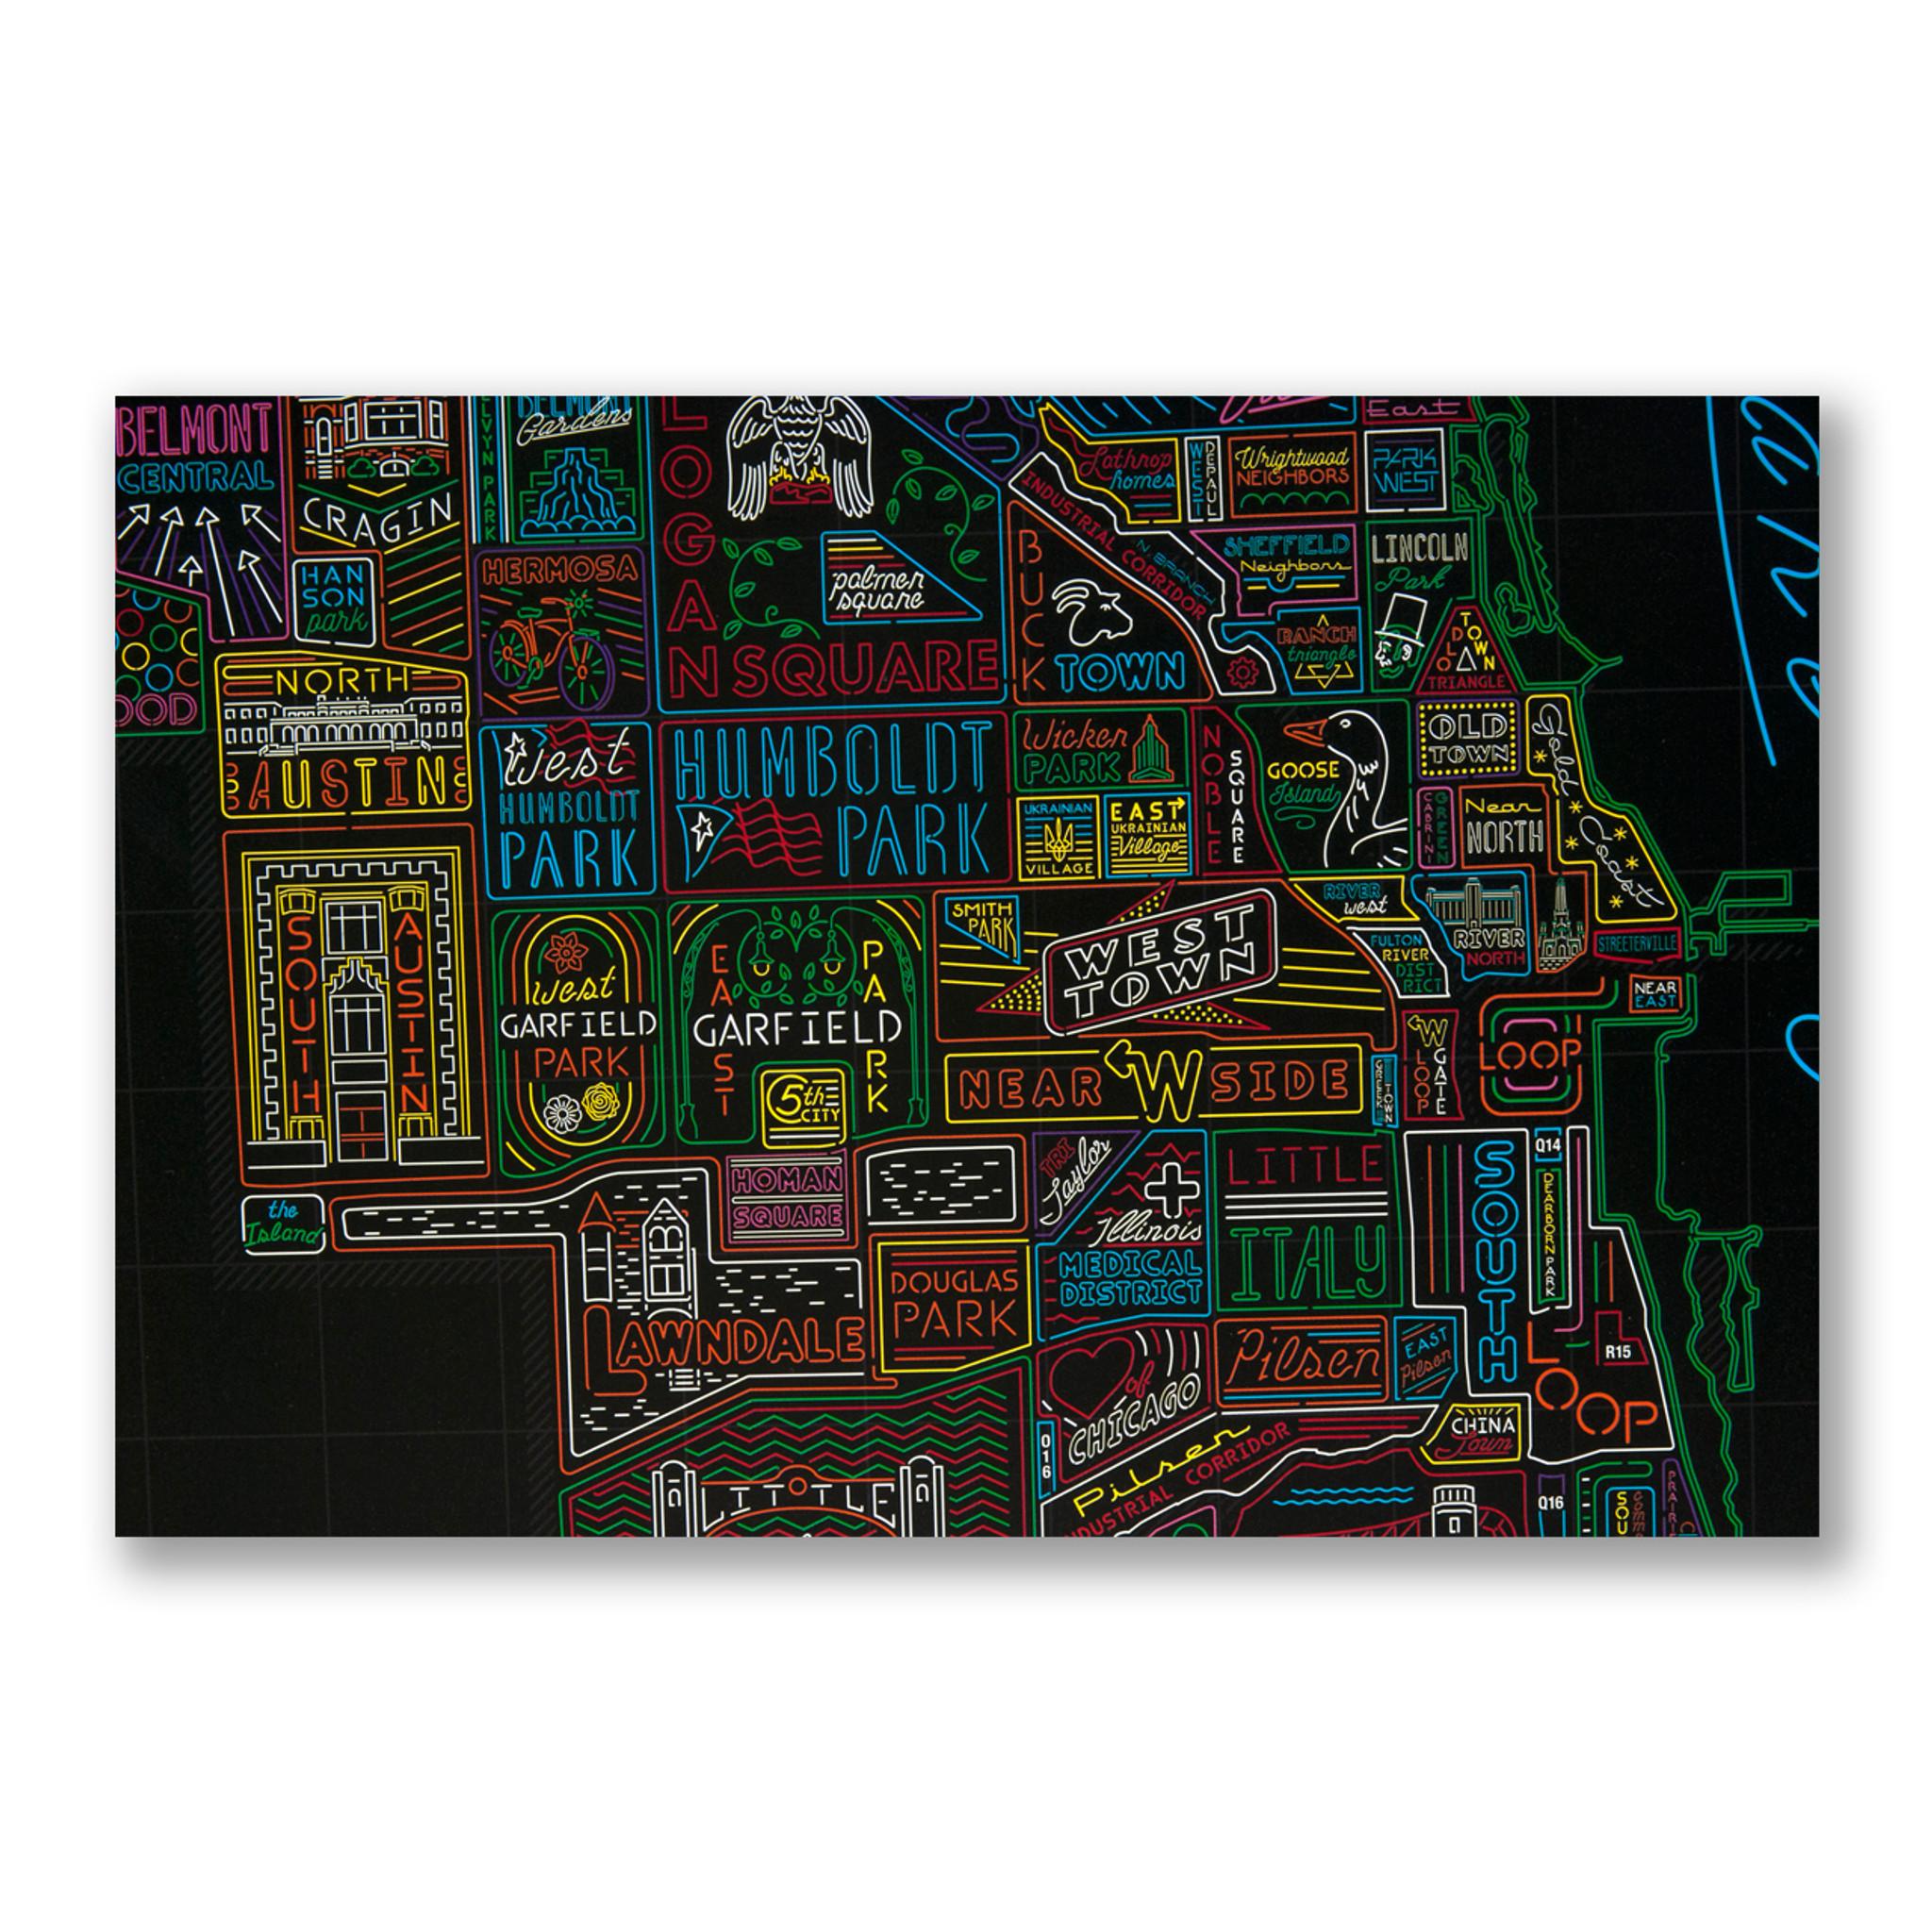 Douglas Park Chicago Map.Neon Neighborhood Map Of Chicago